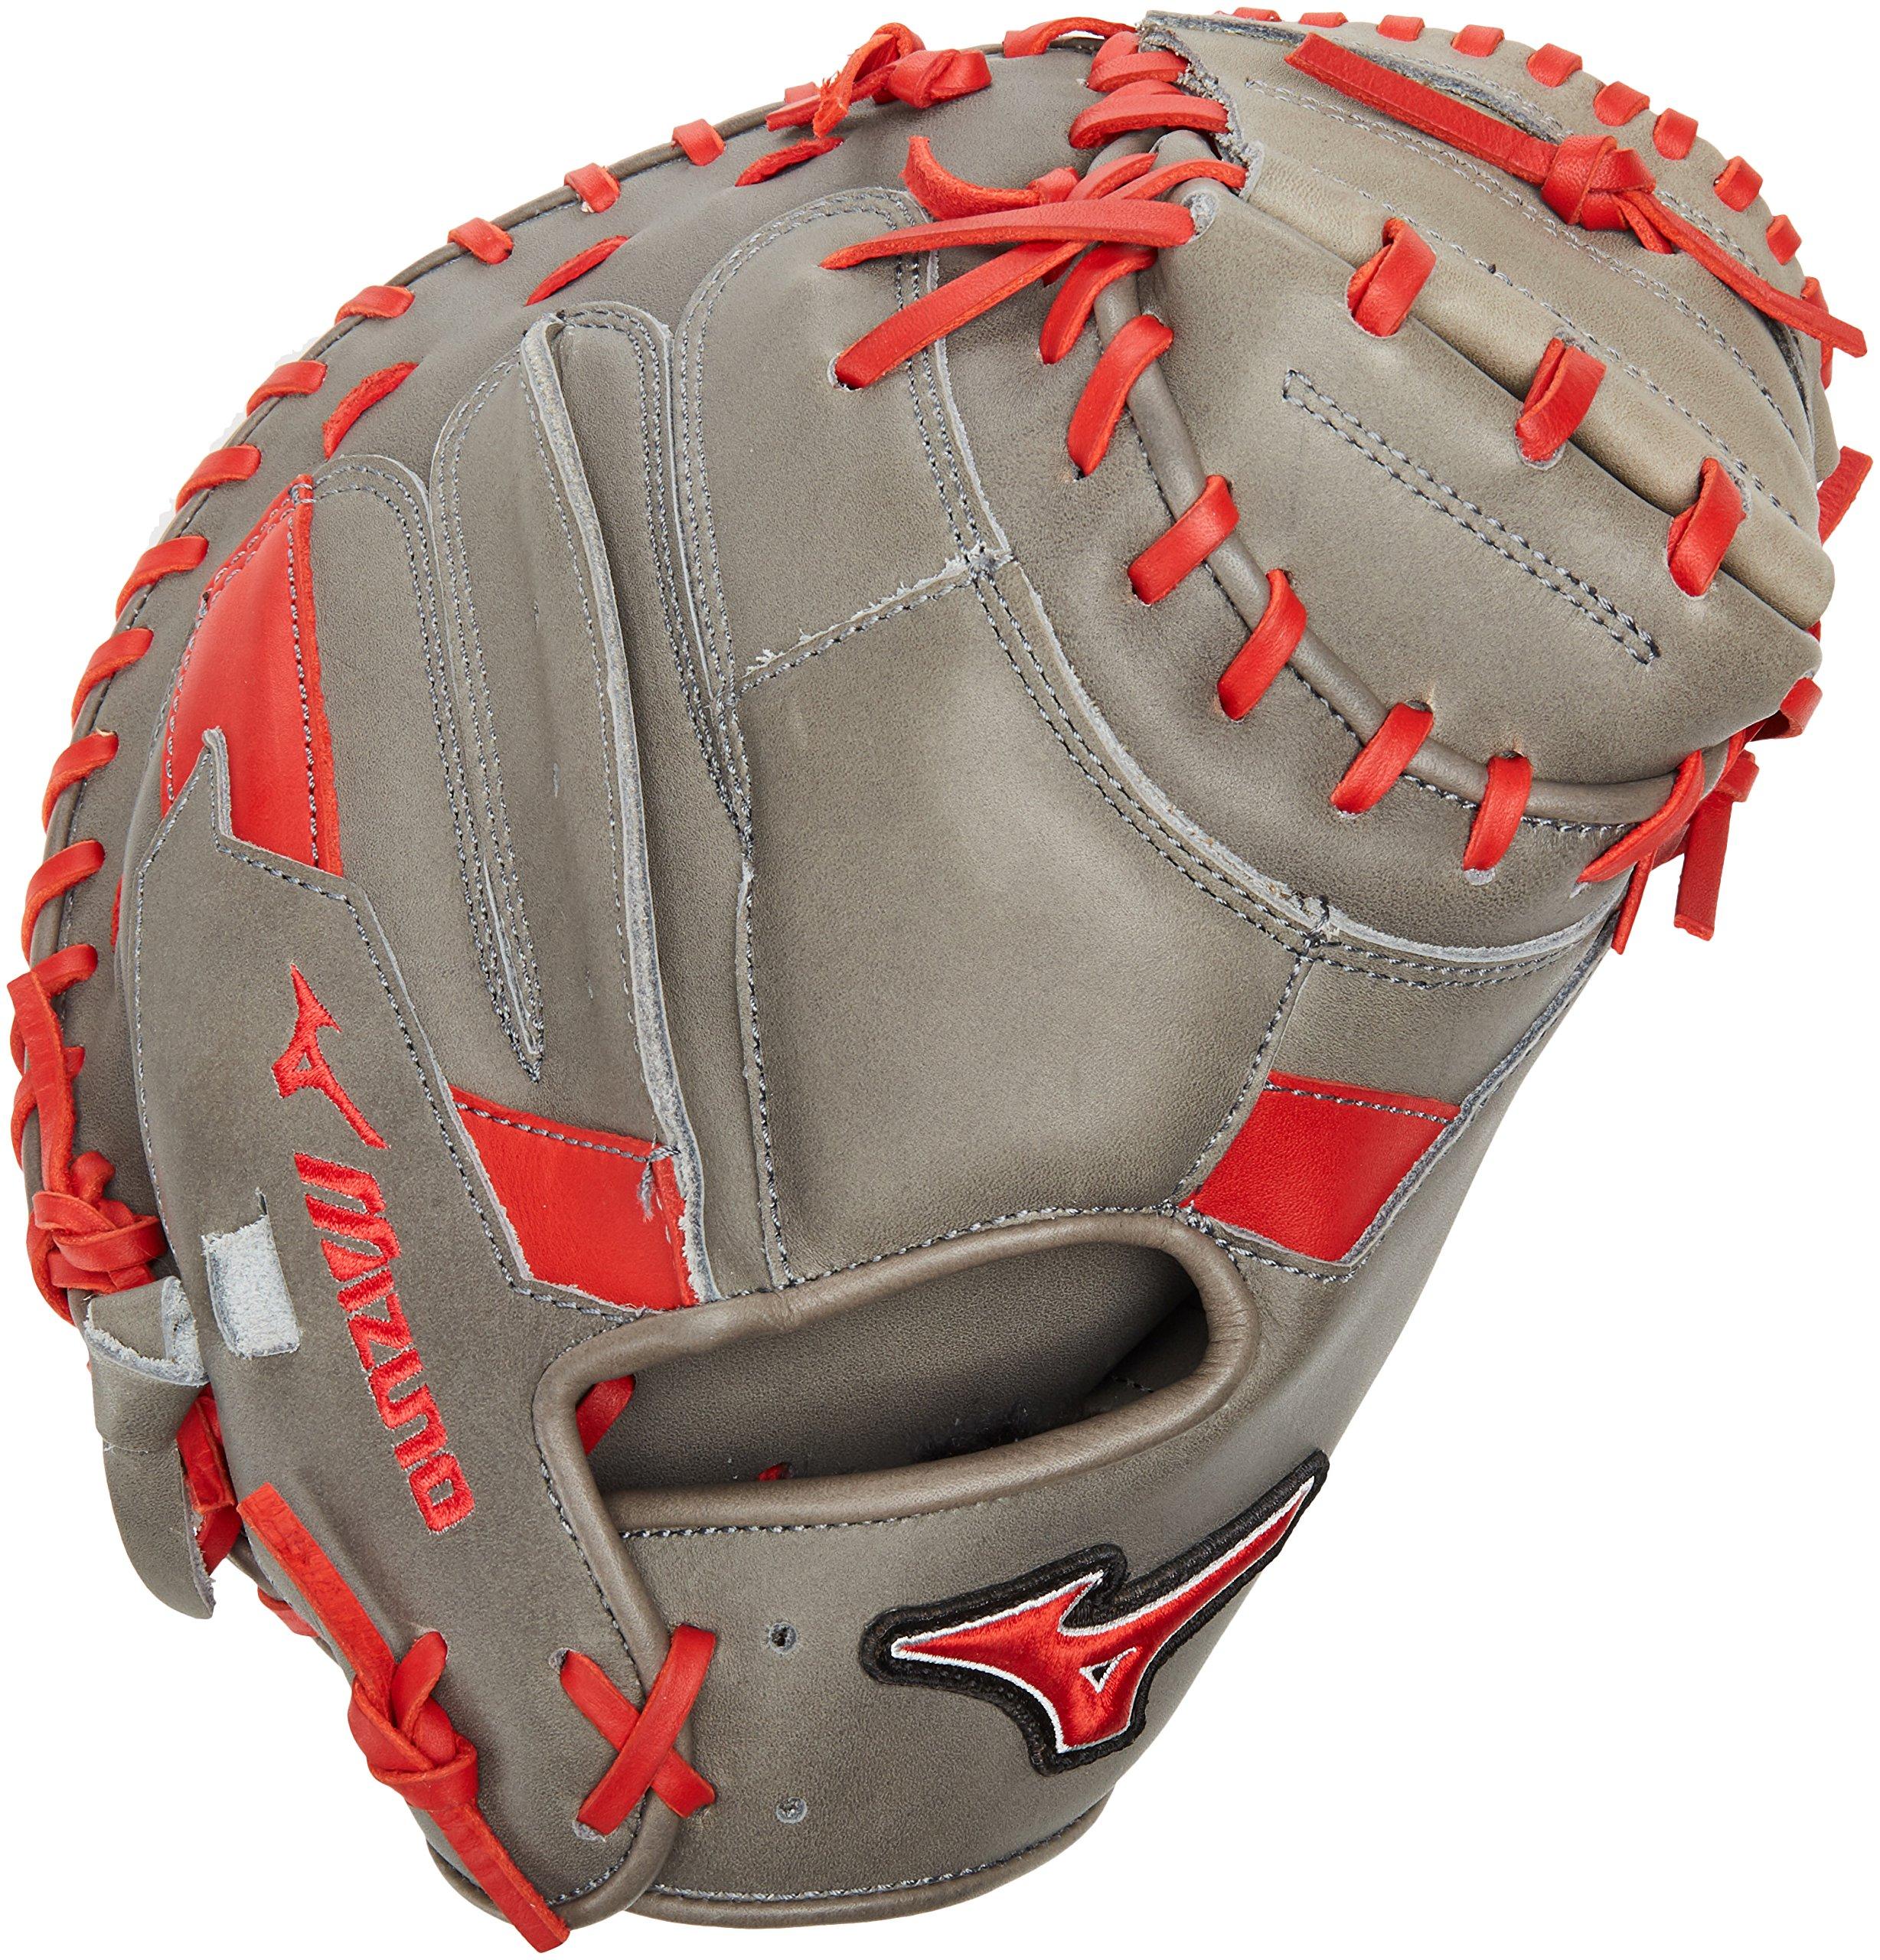 Mizuno MVP Prime Special Edition 34'' Catchers Mitt - GXC50PSE5, Smoke-Red, 34 INCHES (3400) by Mizuno